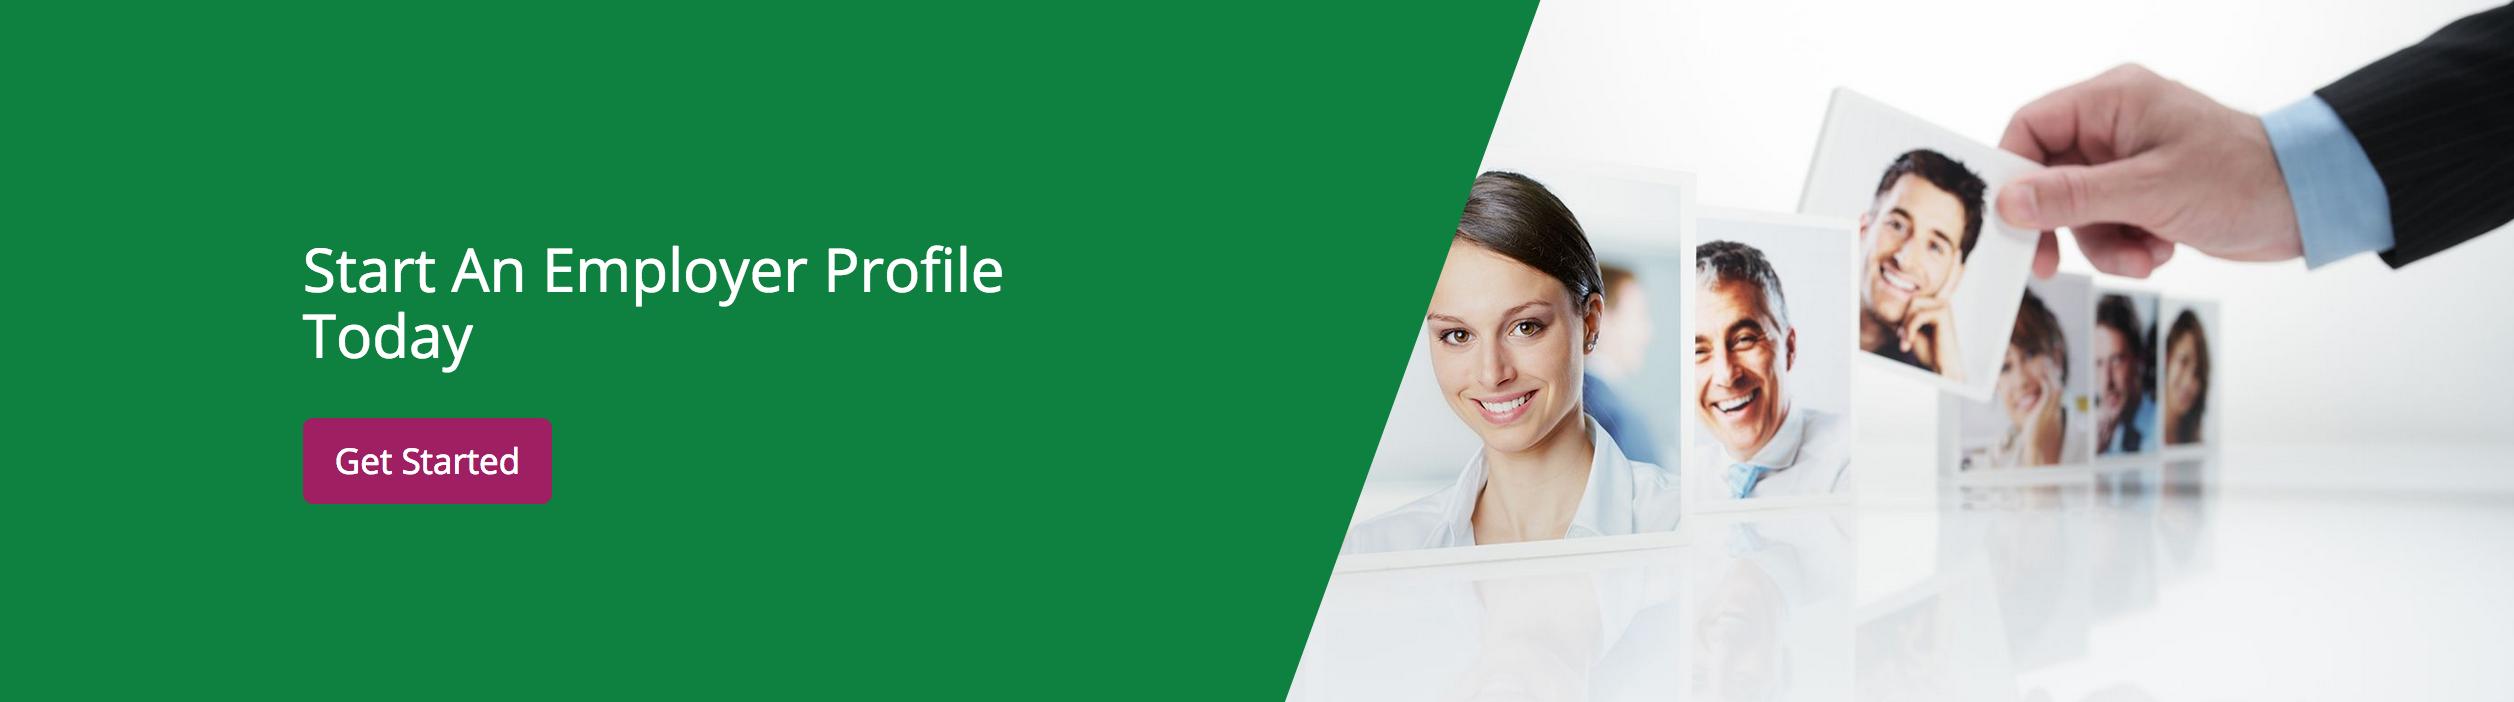 employer profile pinnacle pro staffing